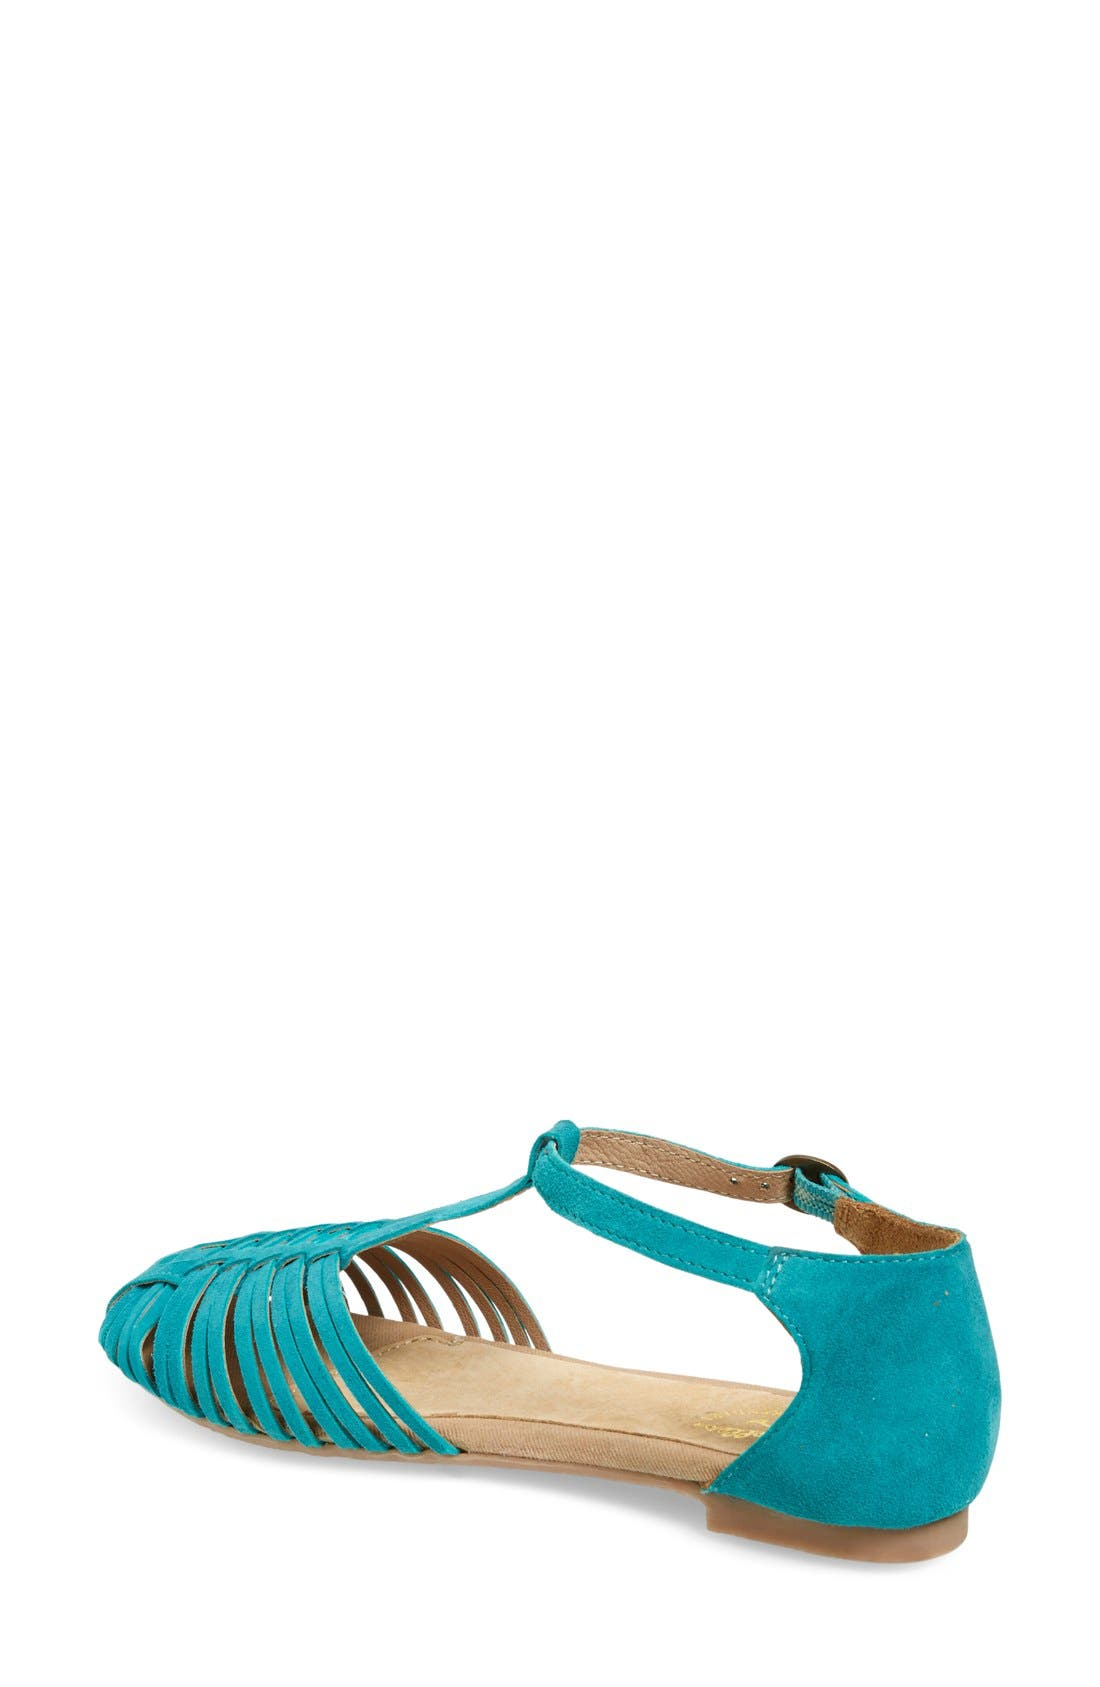 Alternate Image 2  - Seychelles 'Into Thin Air' Leather Huarache Flat Sandal (Women)